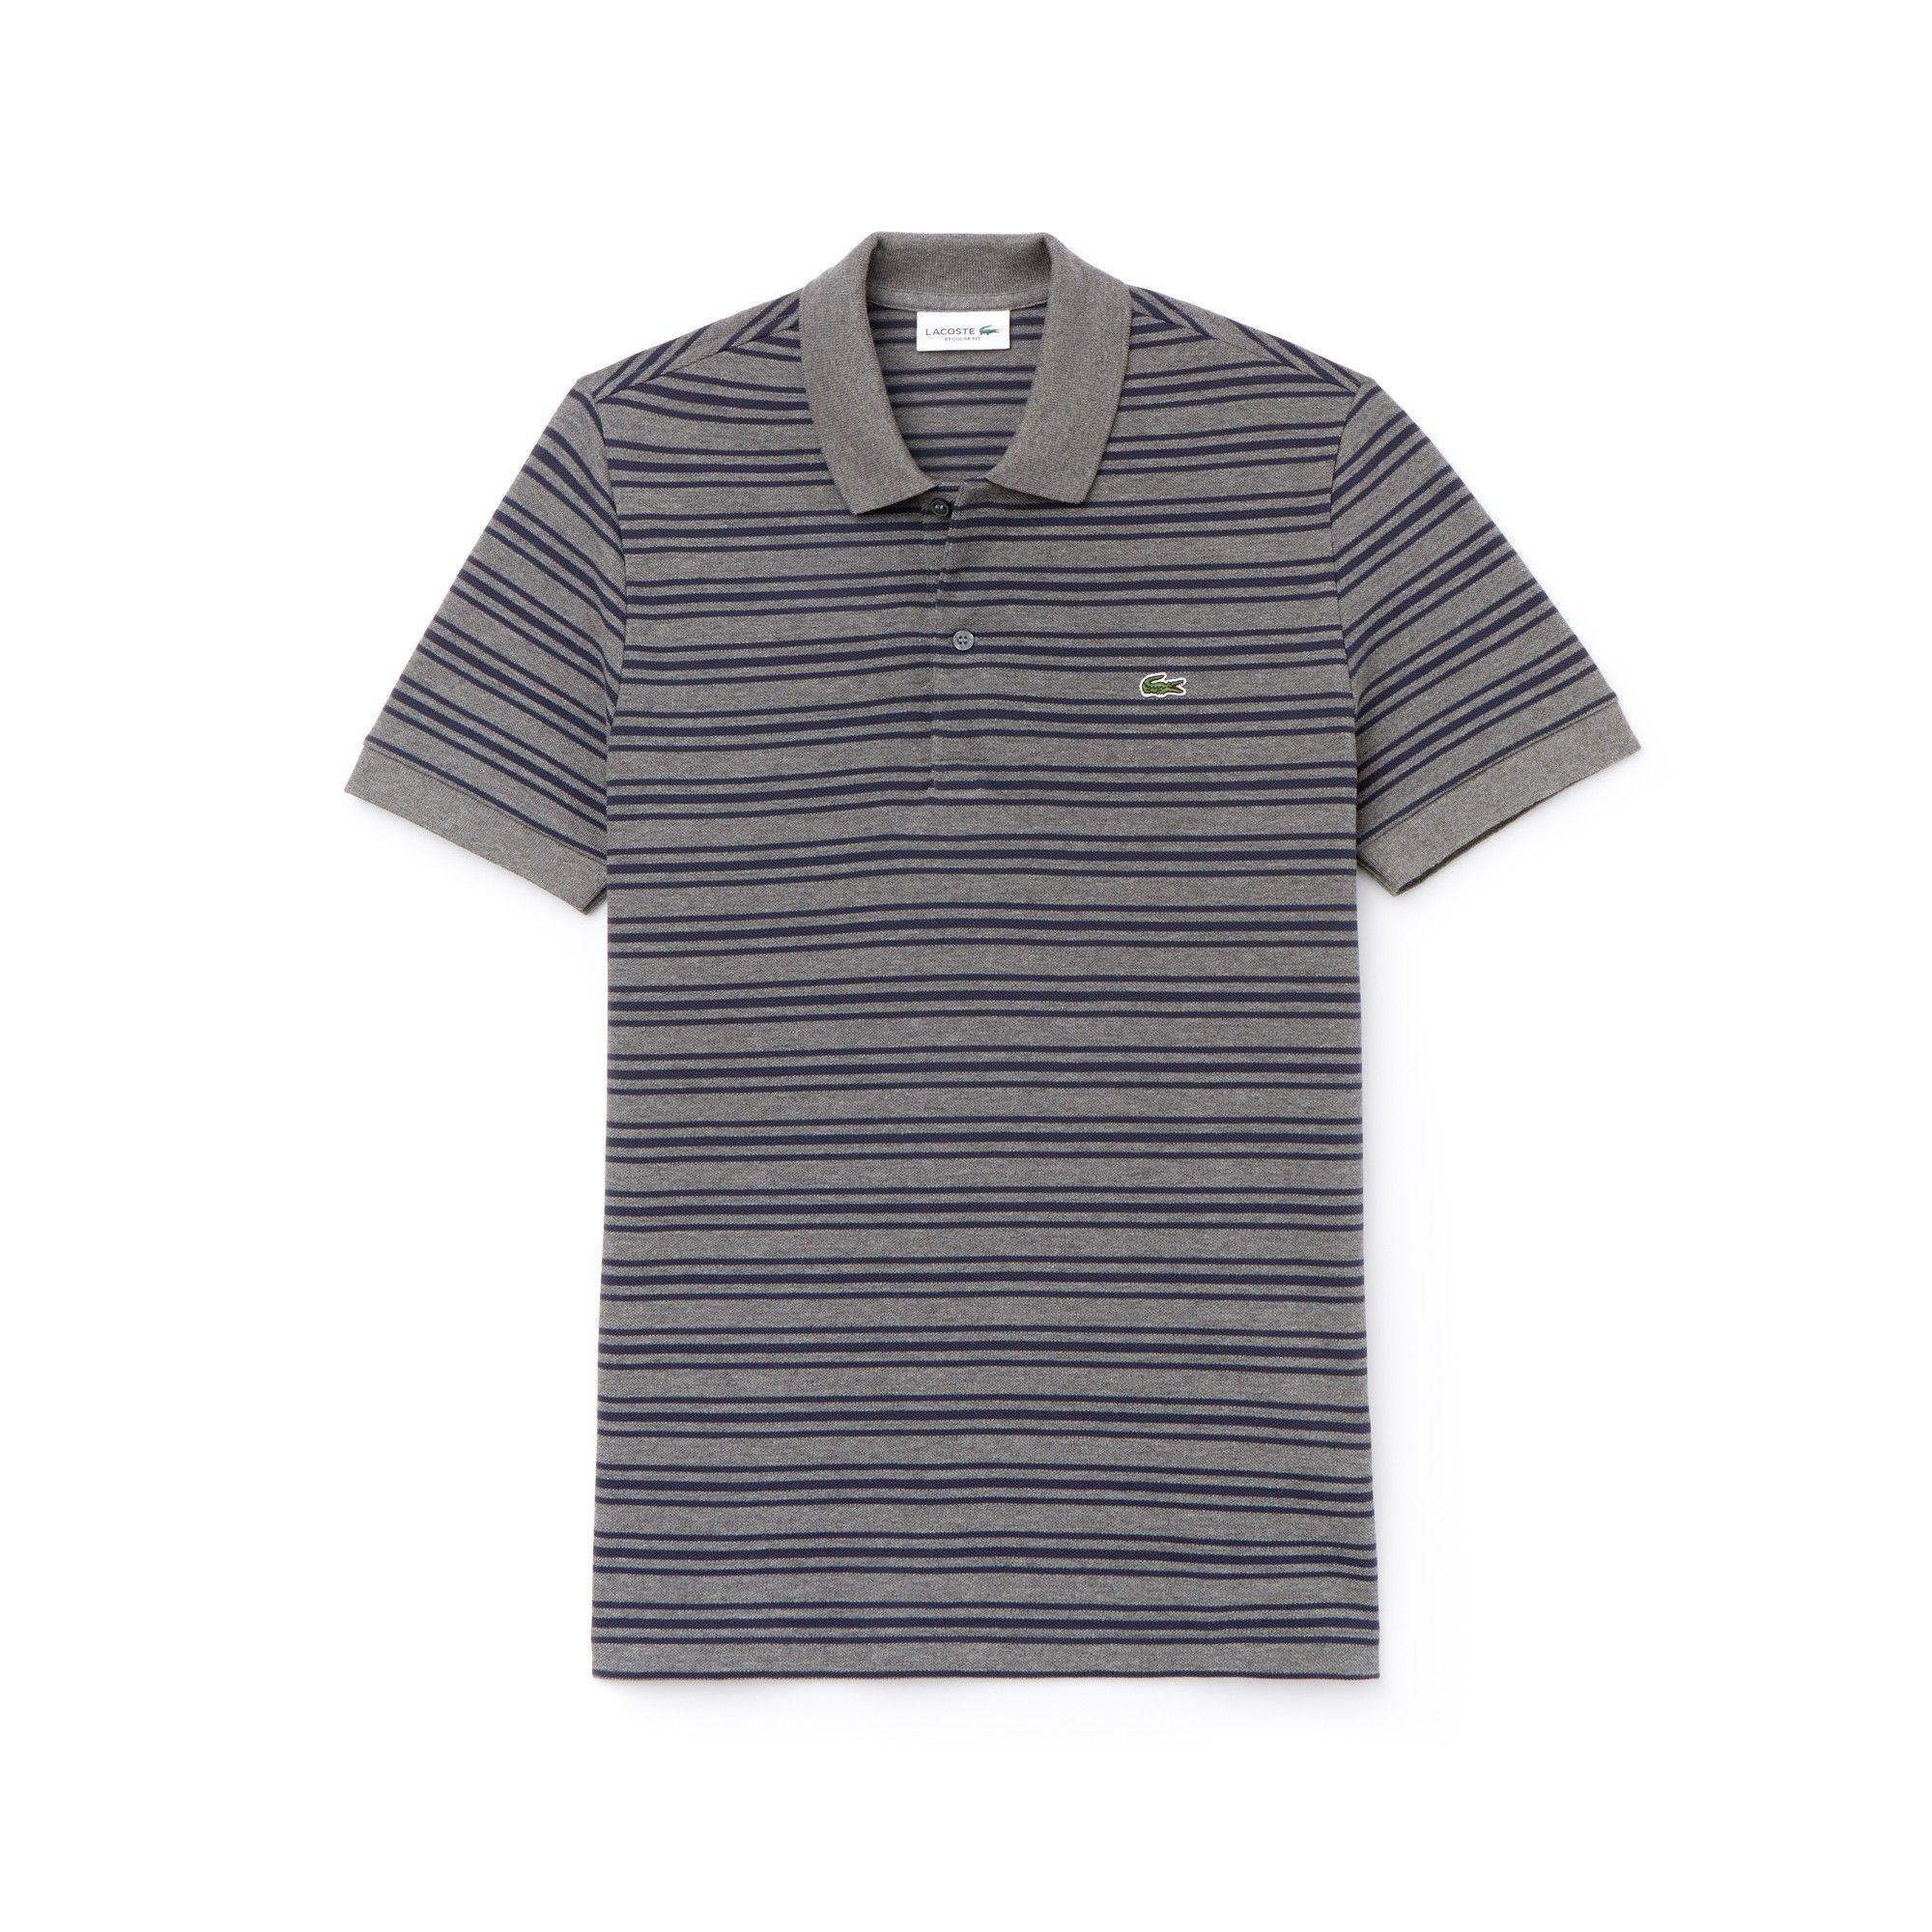 bb18d660 Lacoste Men's Regular Fit Striped Cotton Petit Piqué Polo - Stone  Chine/Meridian Blue 3Xl 8 Green